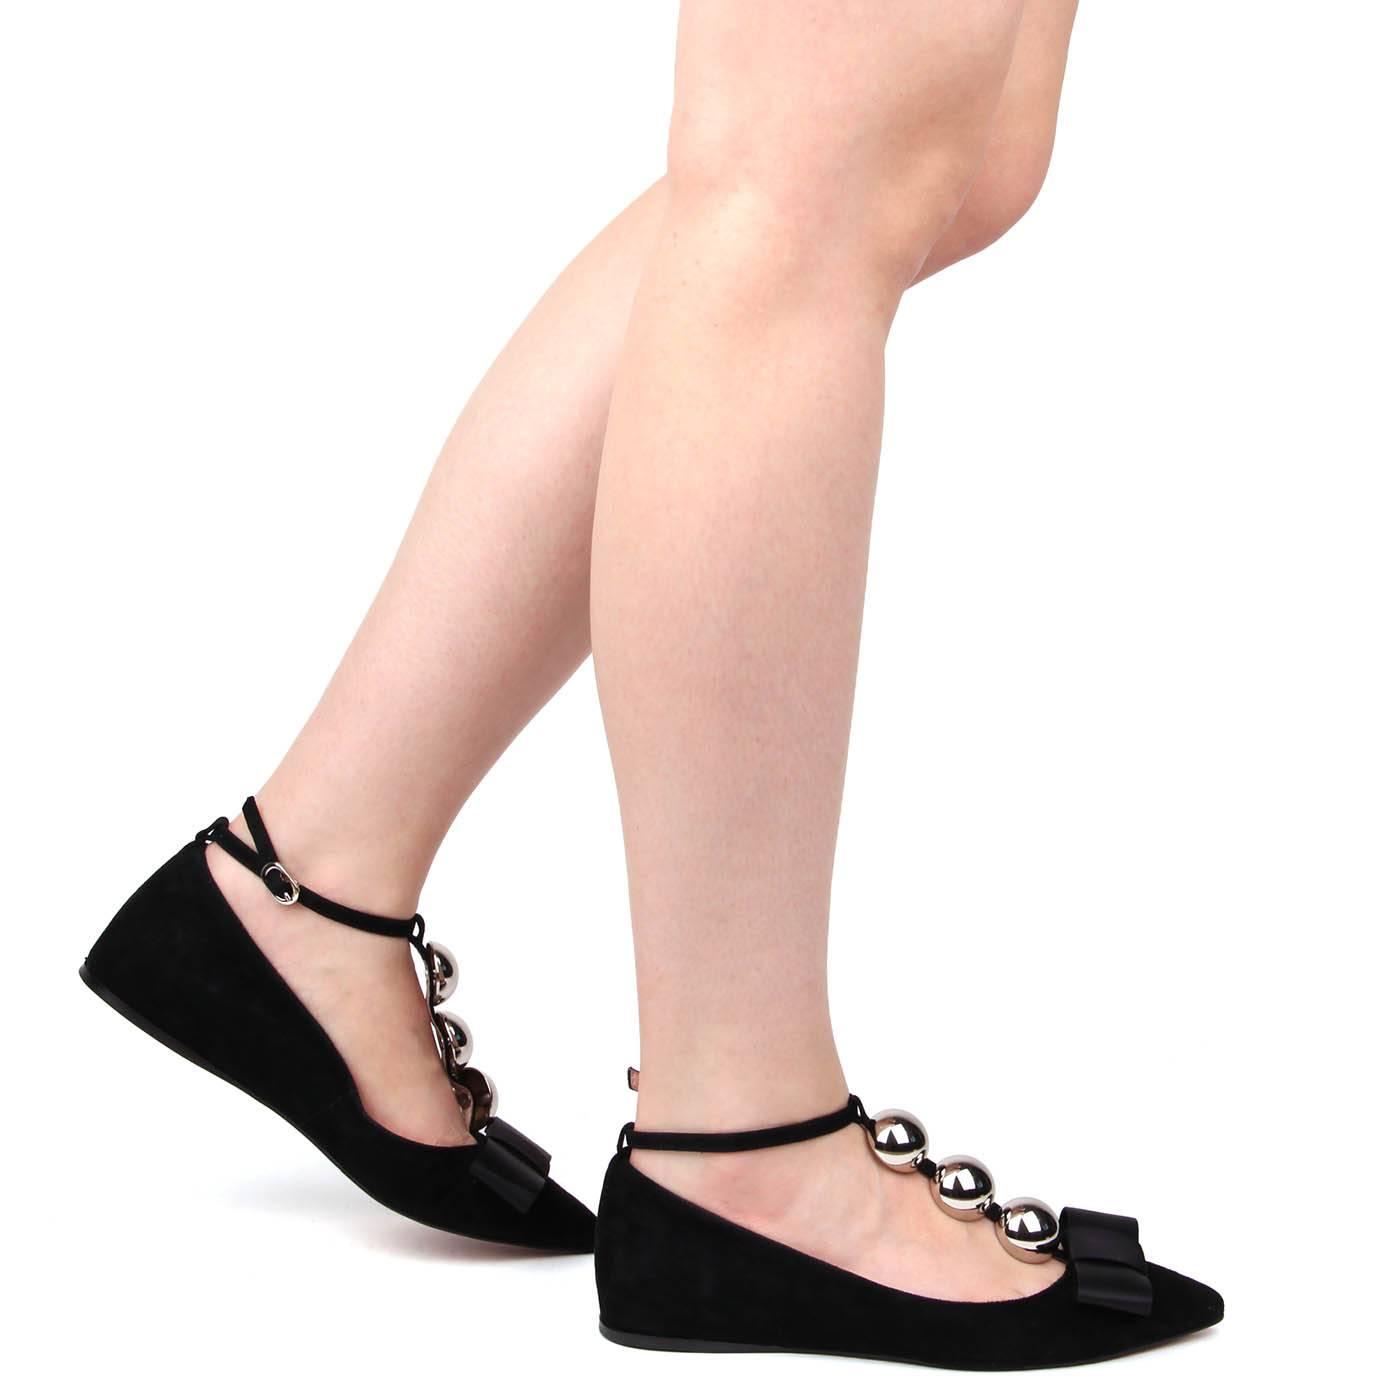 Туфлі жіночі ditto 6477 Чорний купить по выгодной цене в интернет ... 2f1b99c574f46